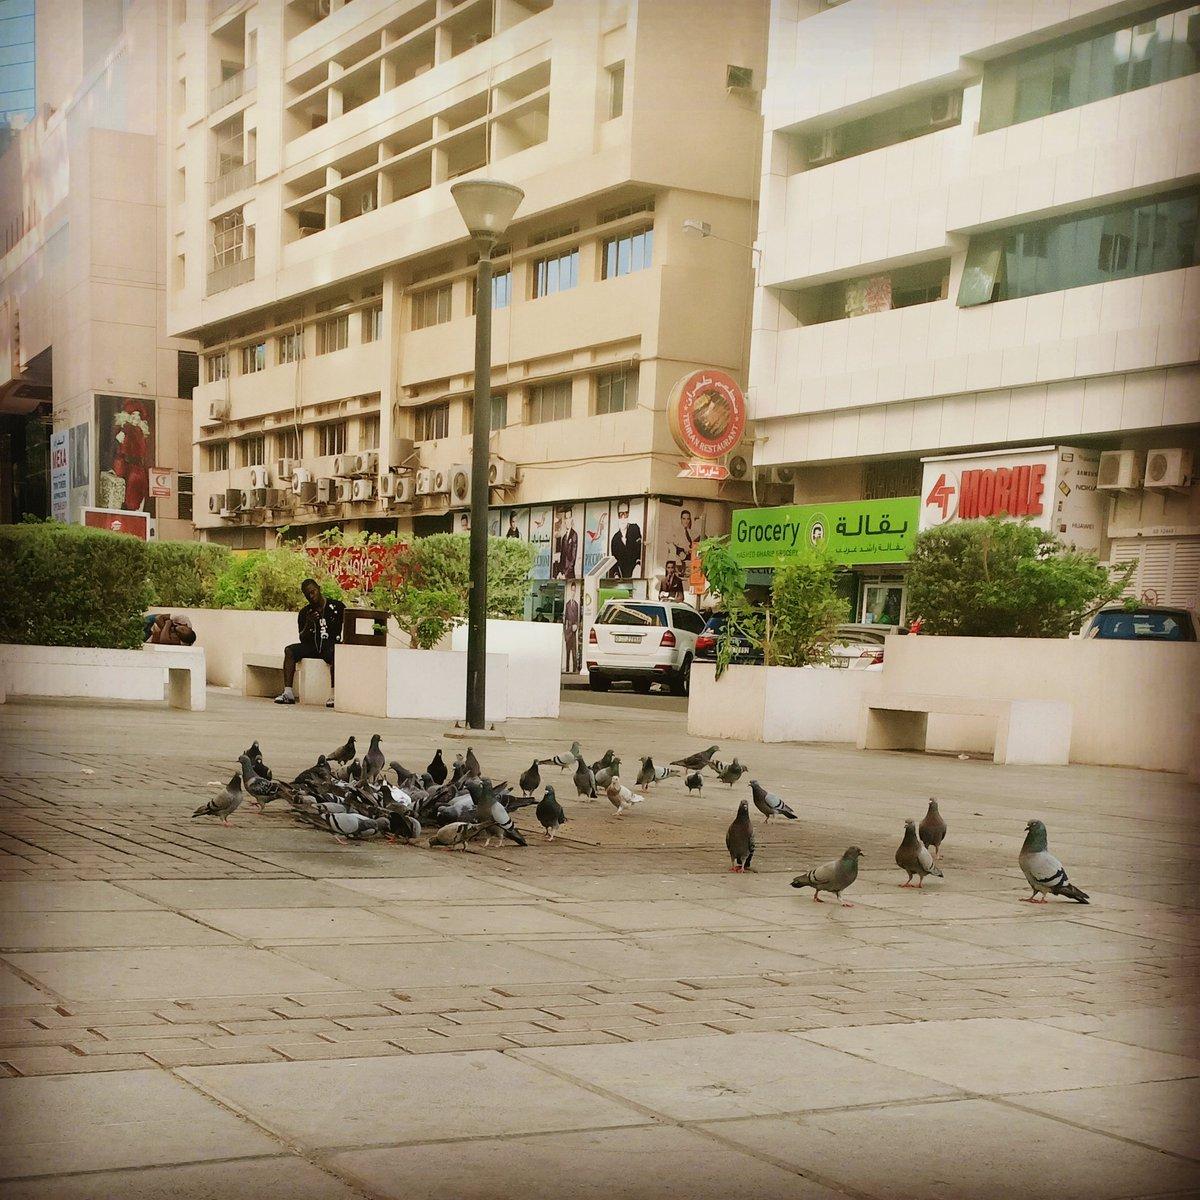 #shooting #tvc #media #Production #Dubai #travelphotography #workout #work #birds